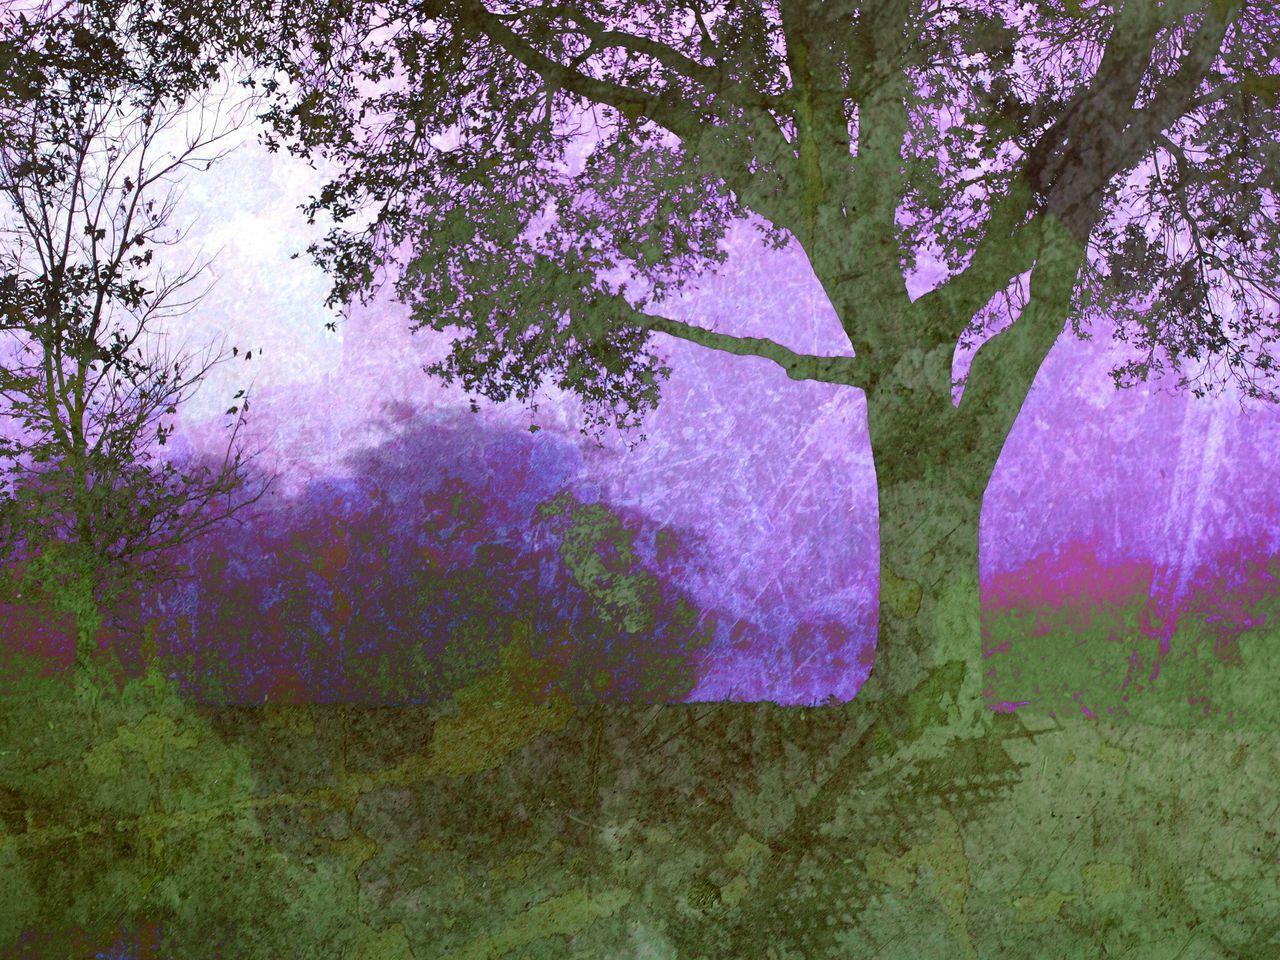 Eye Em Landscape-Collection NEM Landscapes Wearegrryo AMPt_community sgs4, stackables